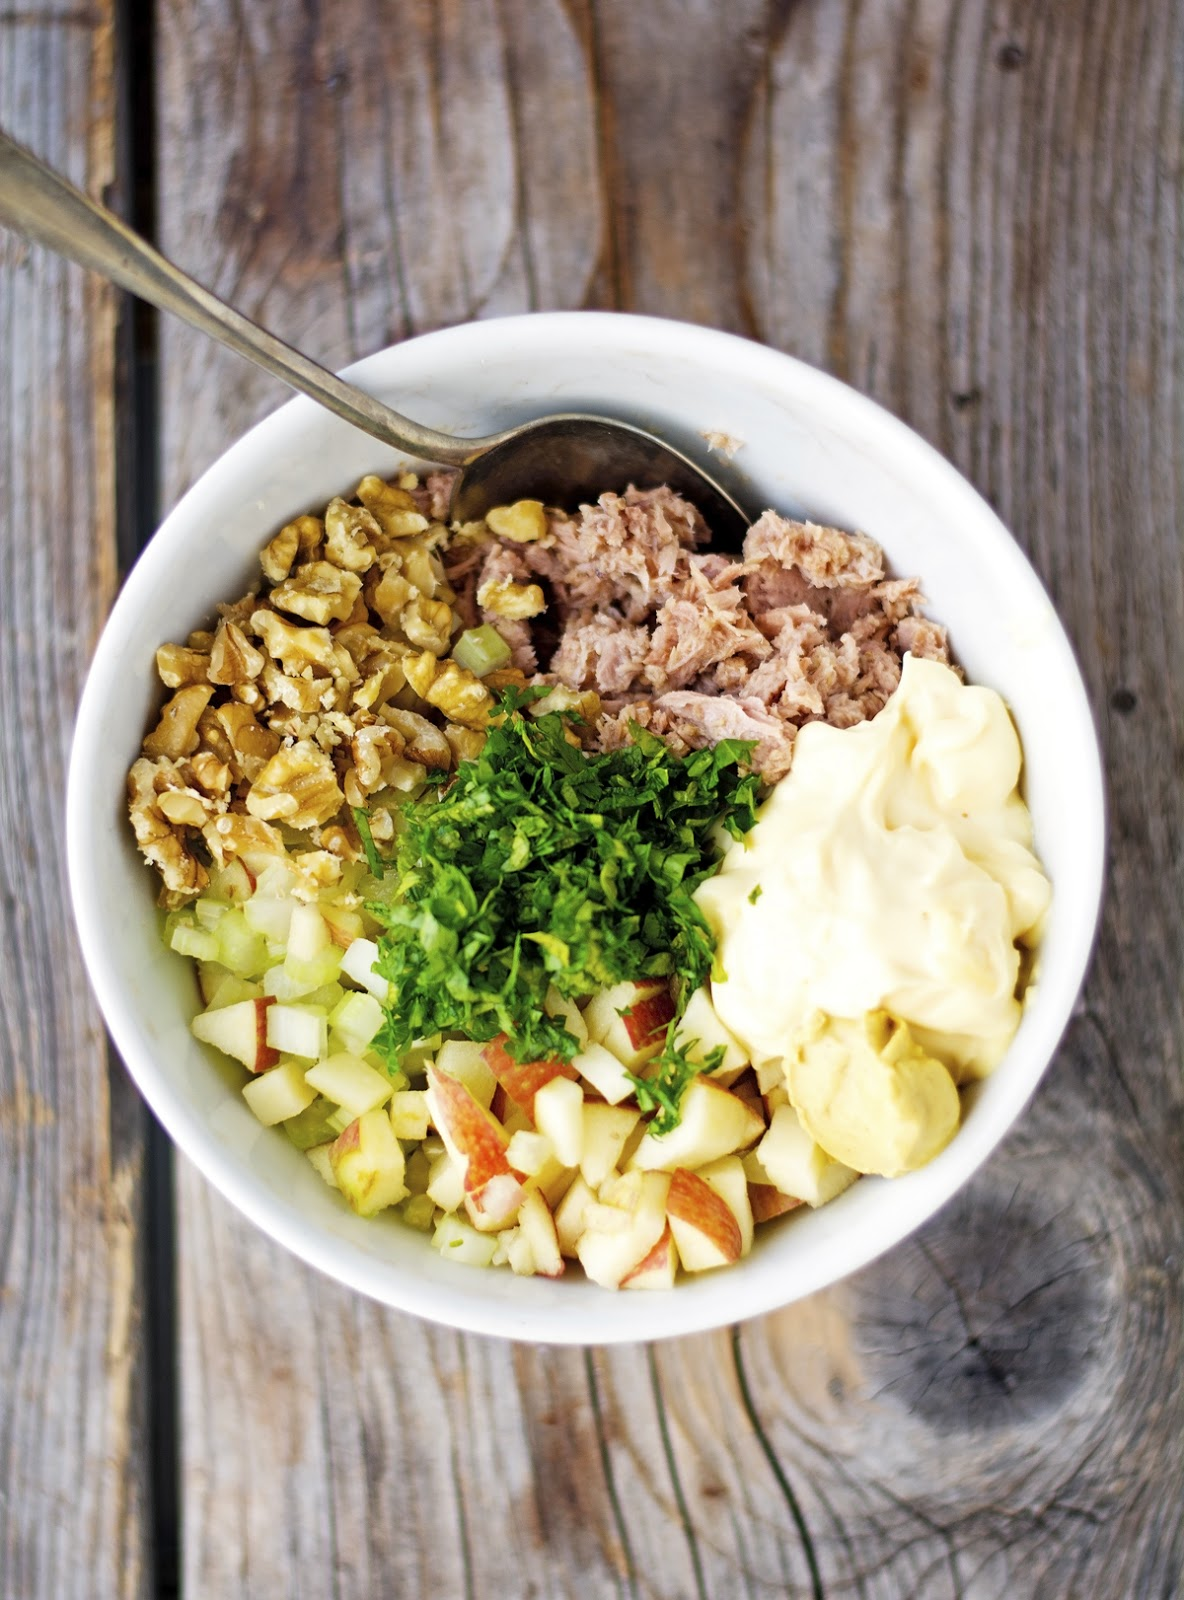 Best Ever Tuna Salad